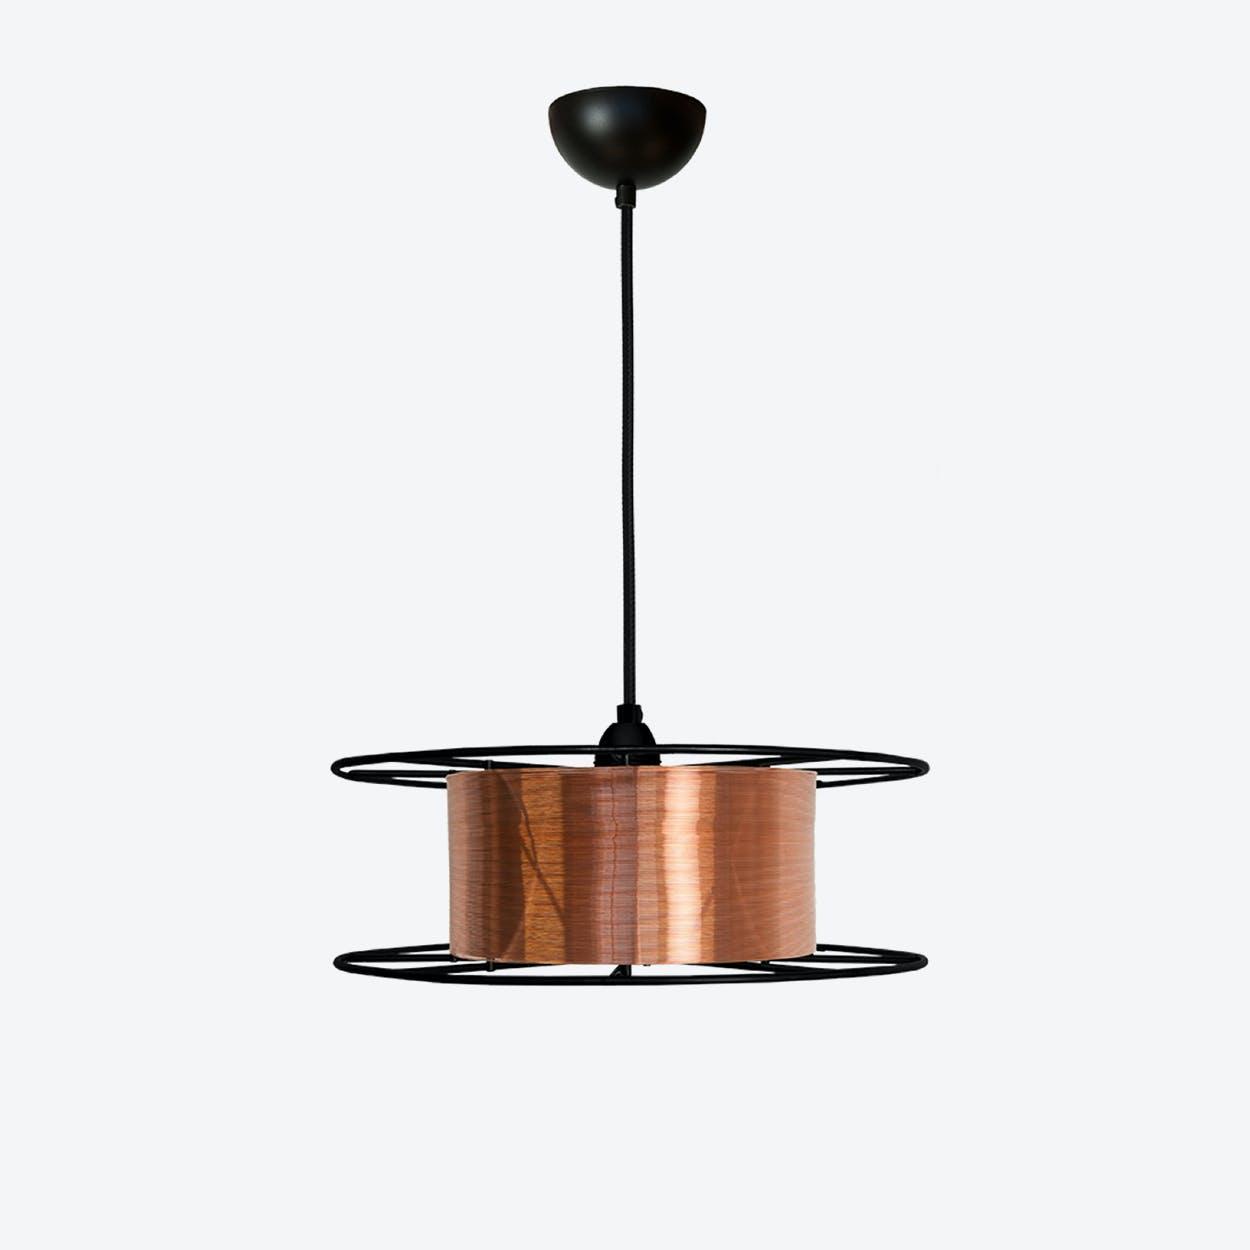 Spool Pendant Light in Black/Copper